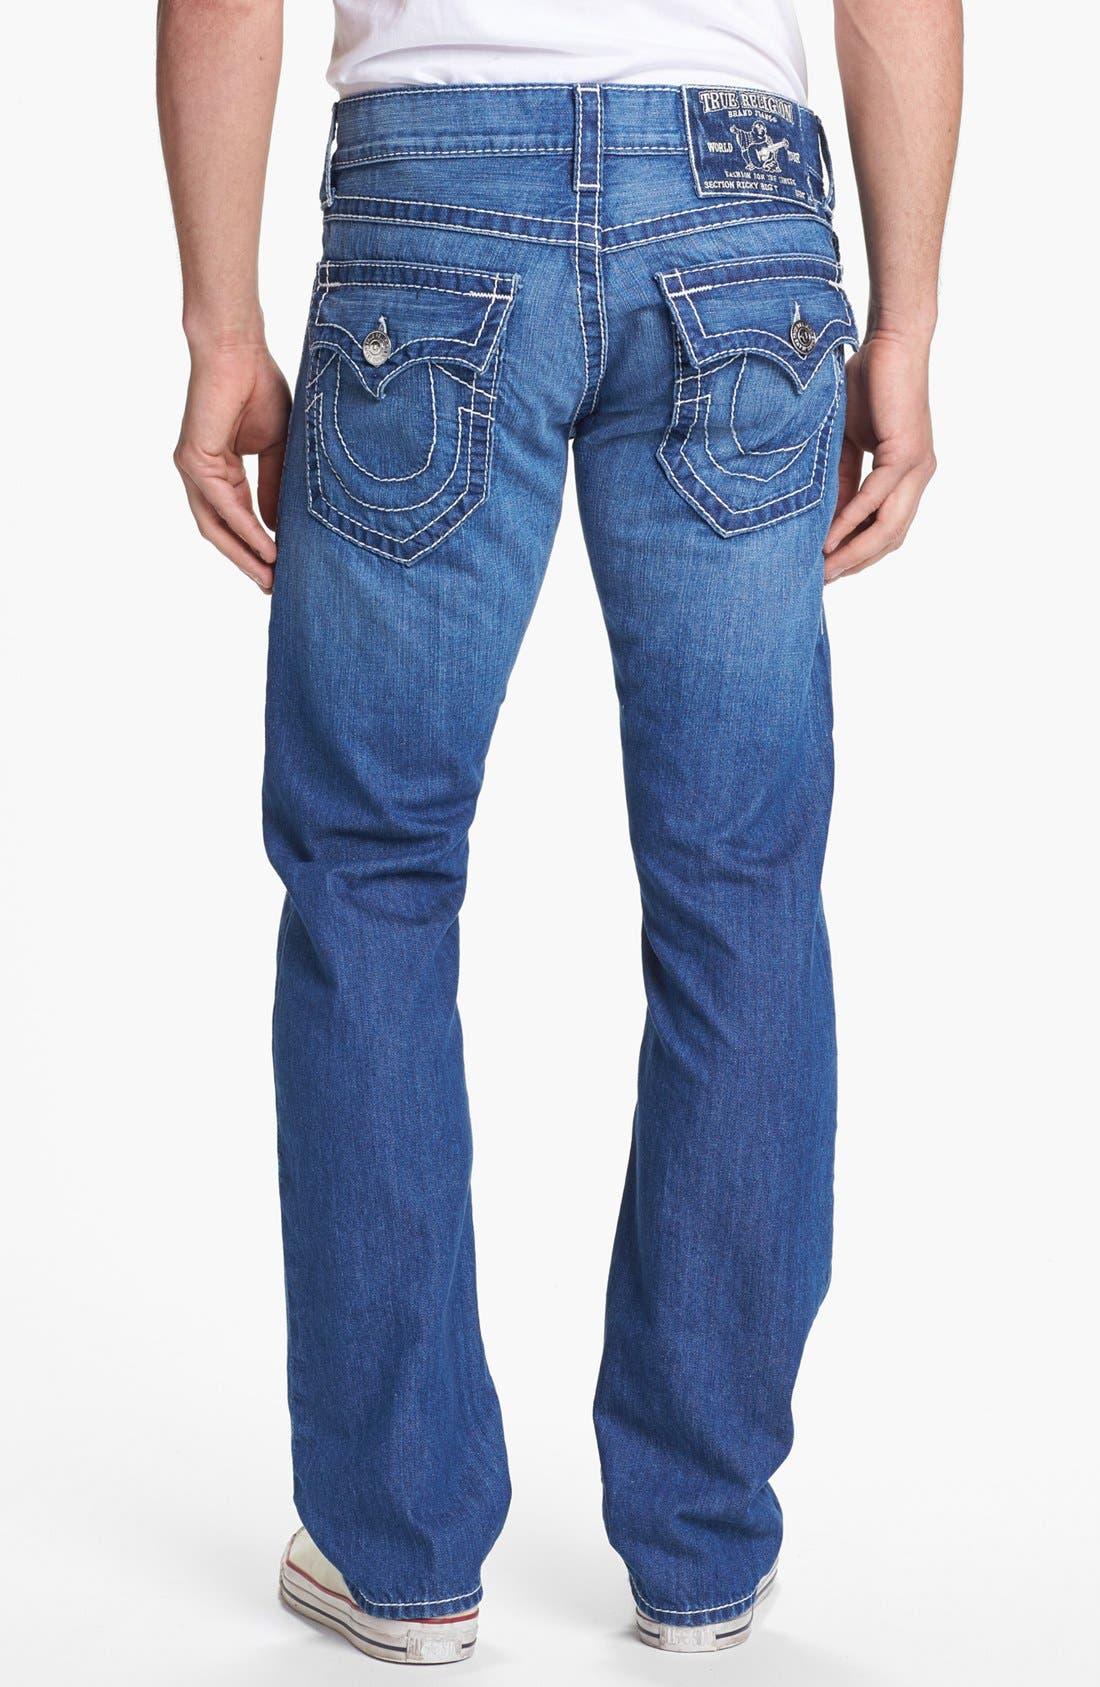 Alternate Image 1 Selected - True Religion Brand Jeans 'Ricky' Straight Leg Jeans (Voyager)